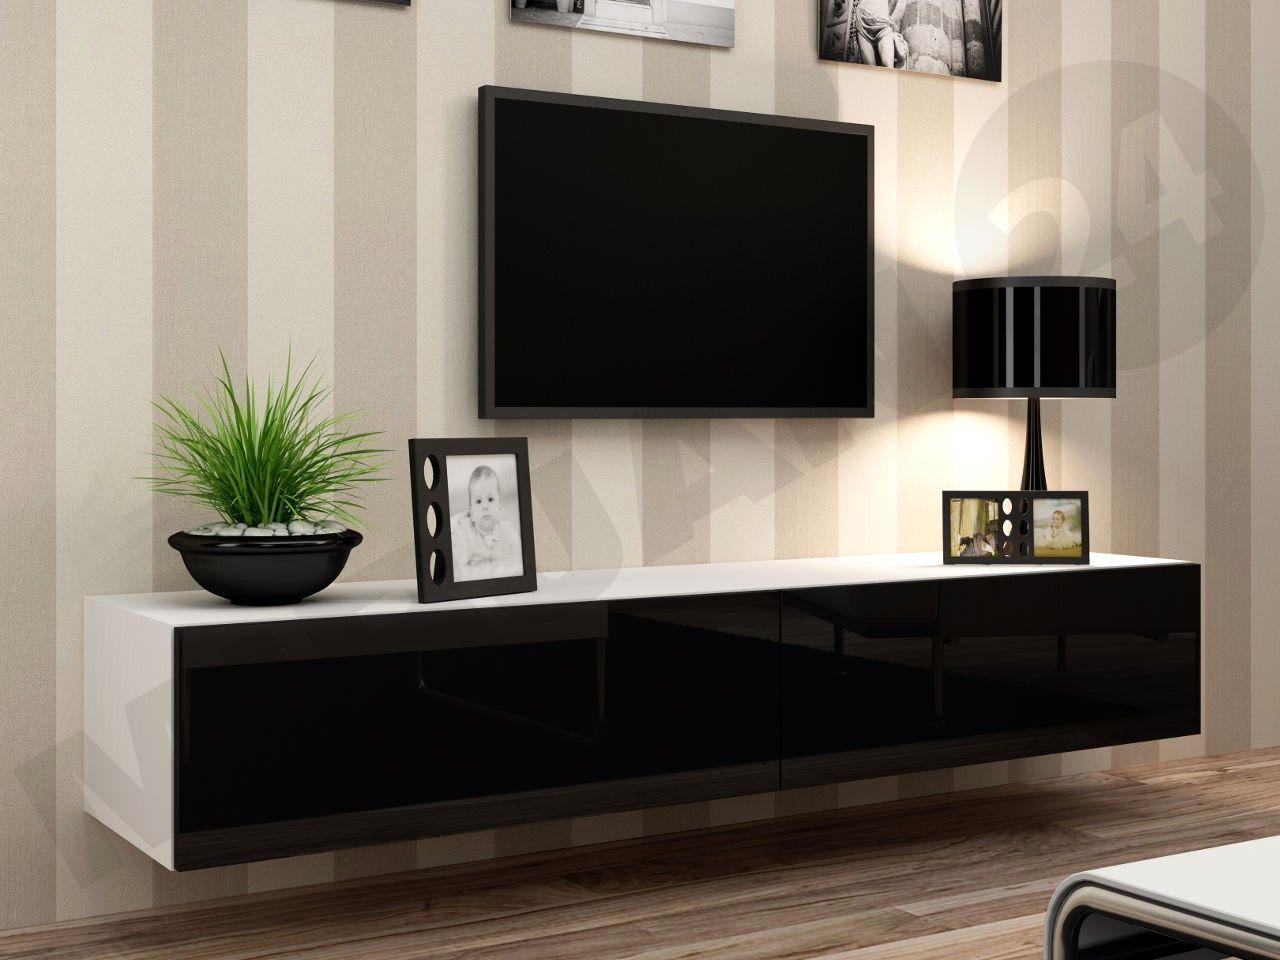 19 Friedlich Hange Tv Schrank Living Room Modern Ikea Tv Wall Unit Modern Tv Wall Units